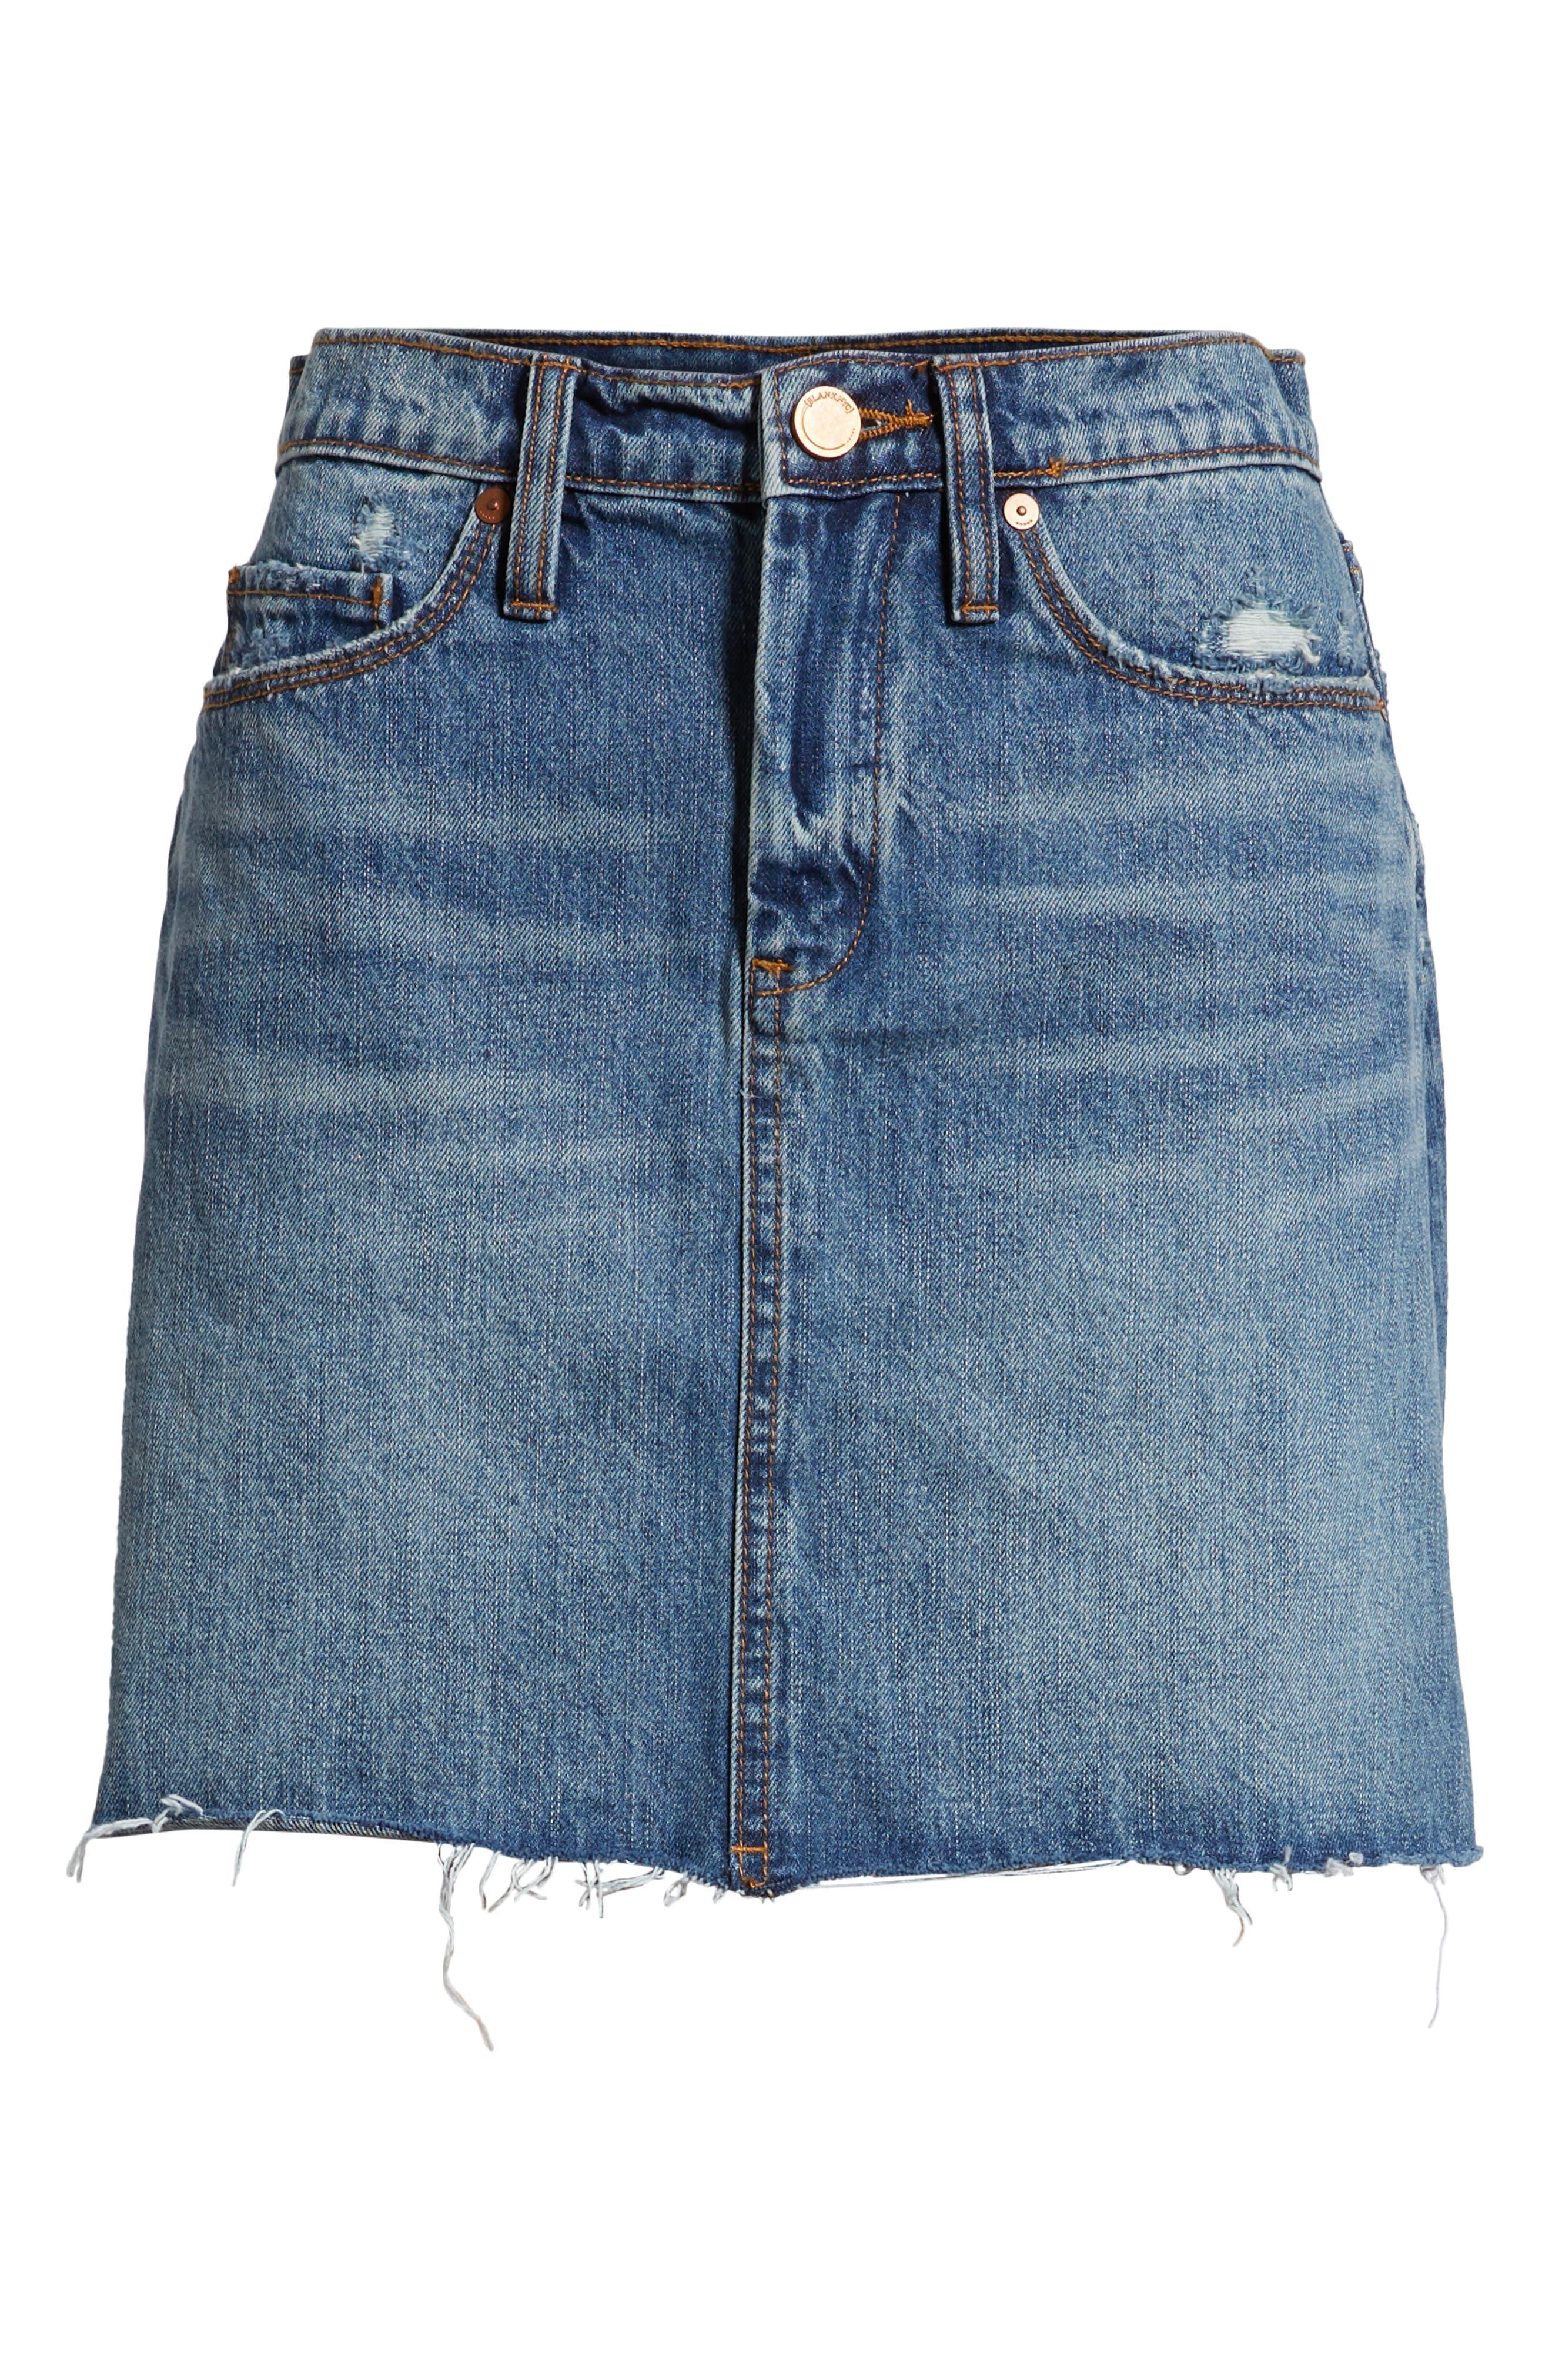 BLANKNYC, Way Back When Cutoff Denim Skirt, Alternate thumbnail 7, color, 400